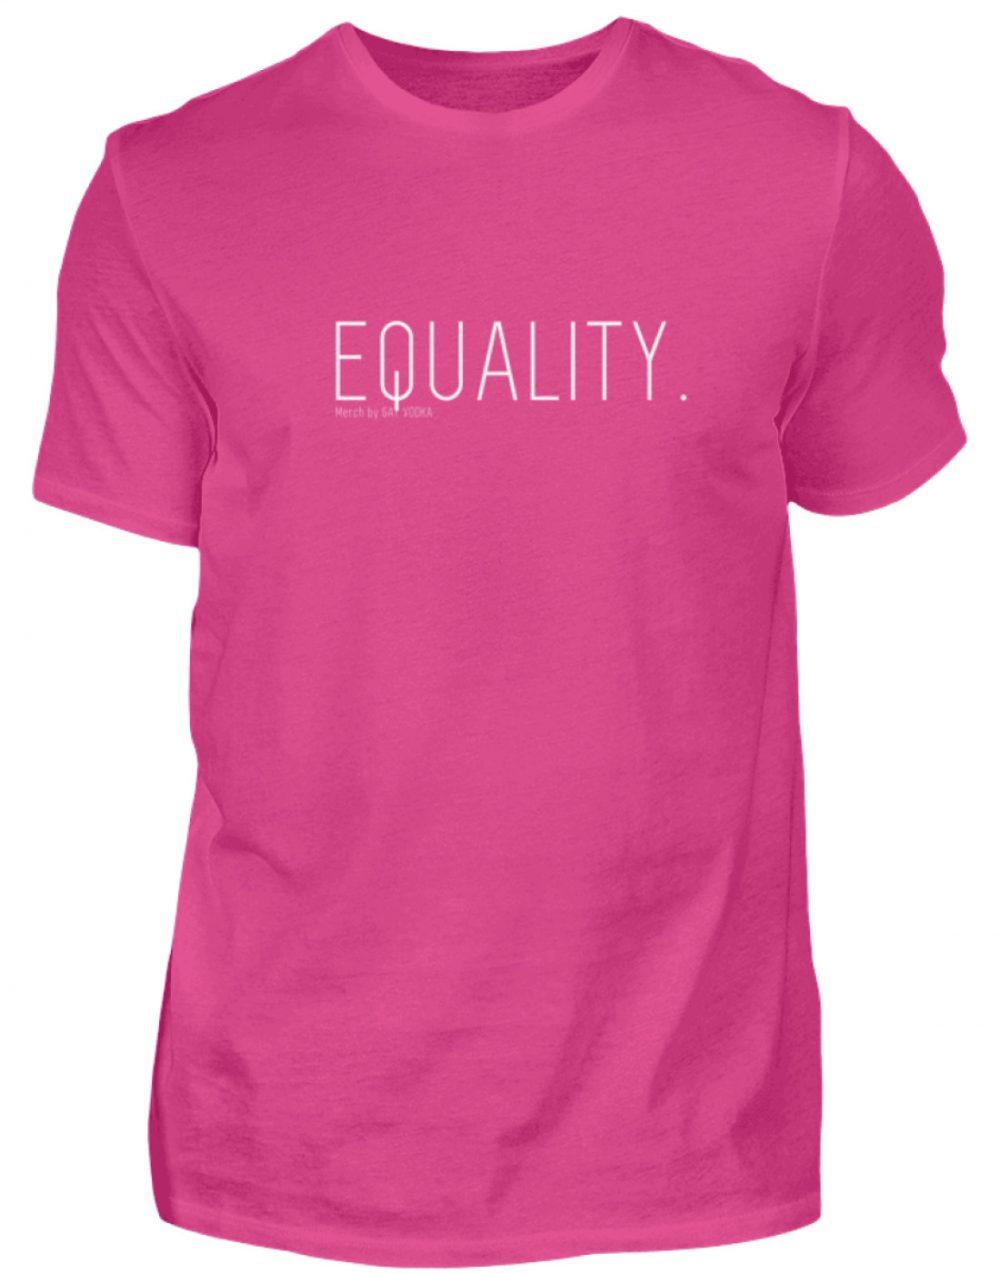 EQUALITY. - Herren Premiumshirt-28